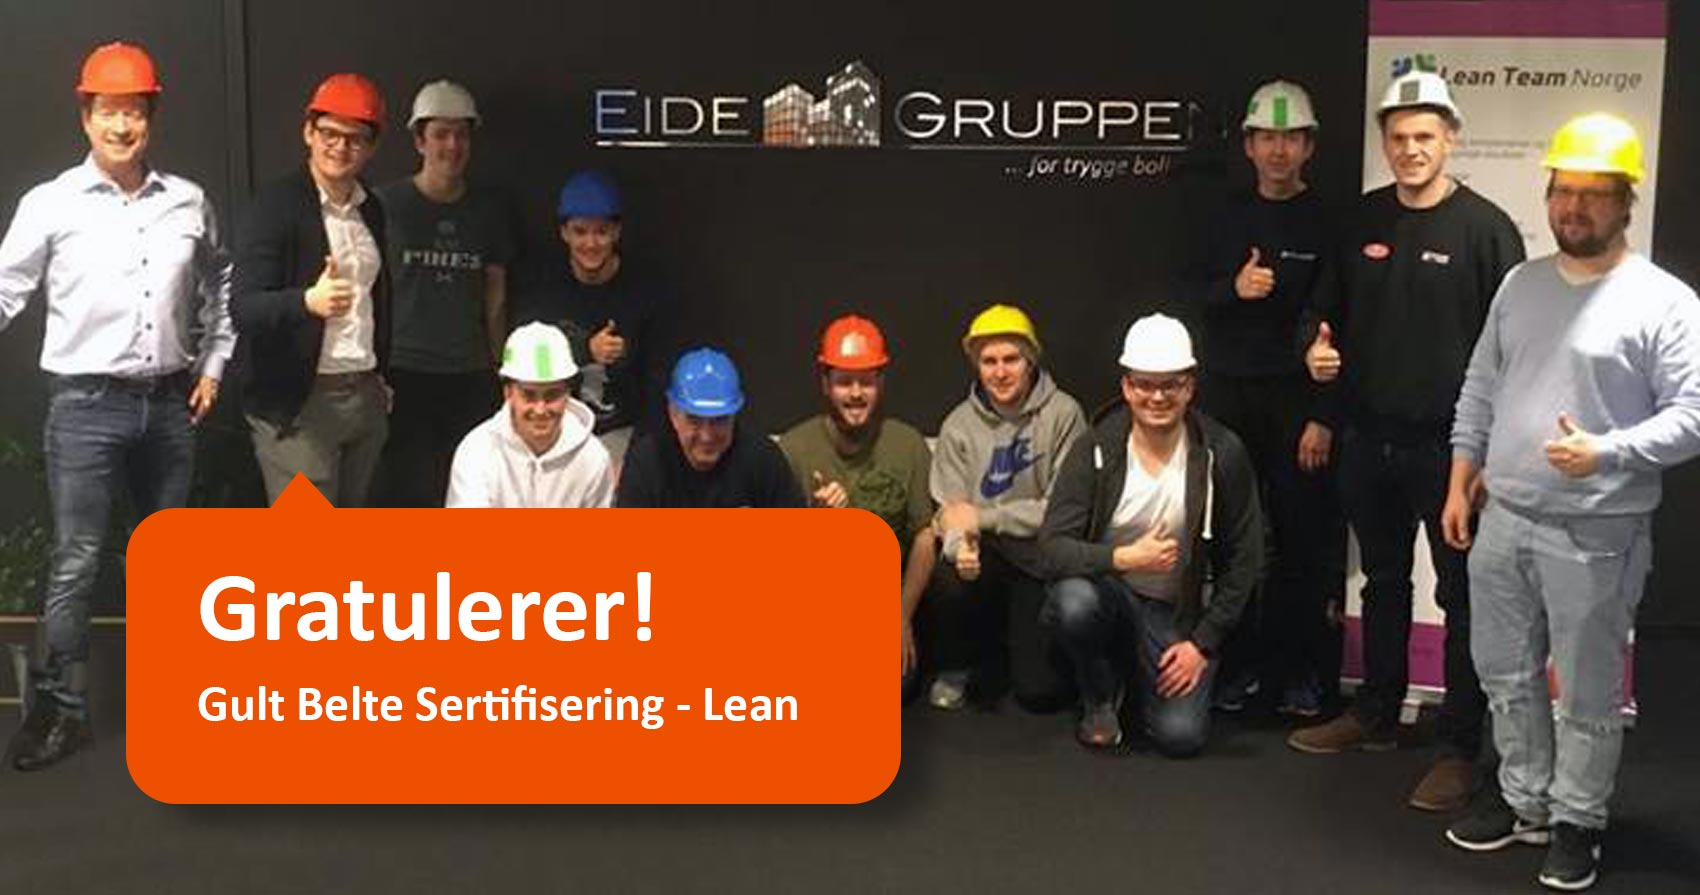 Gratulerer med Gult belte sertifisering Lean Triangel Lean Team Norge